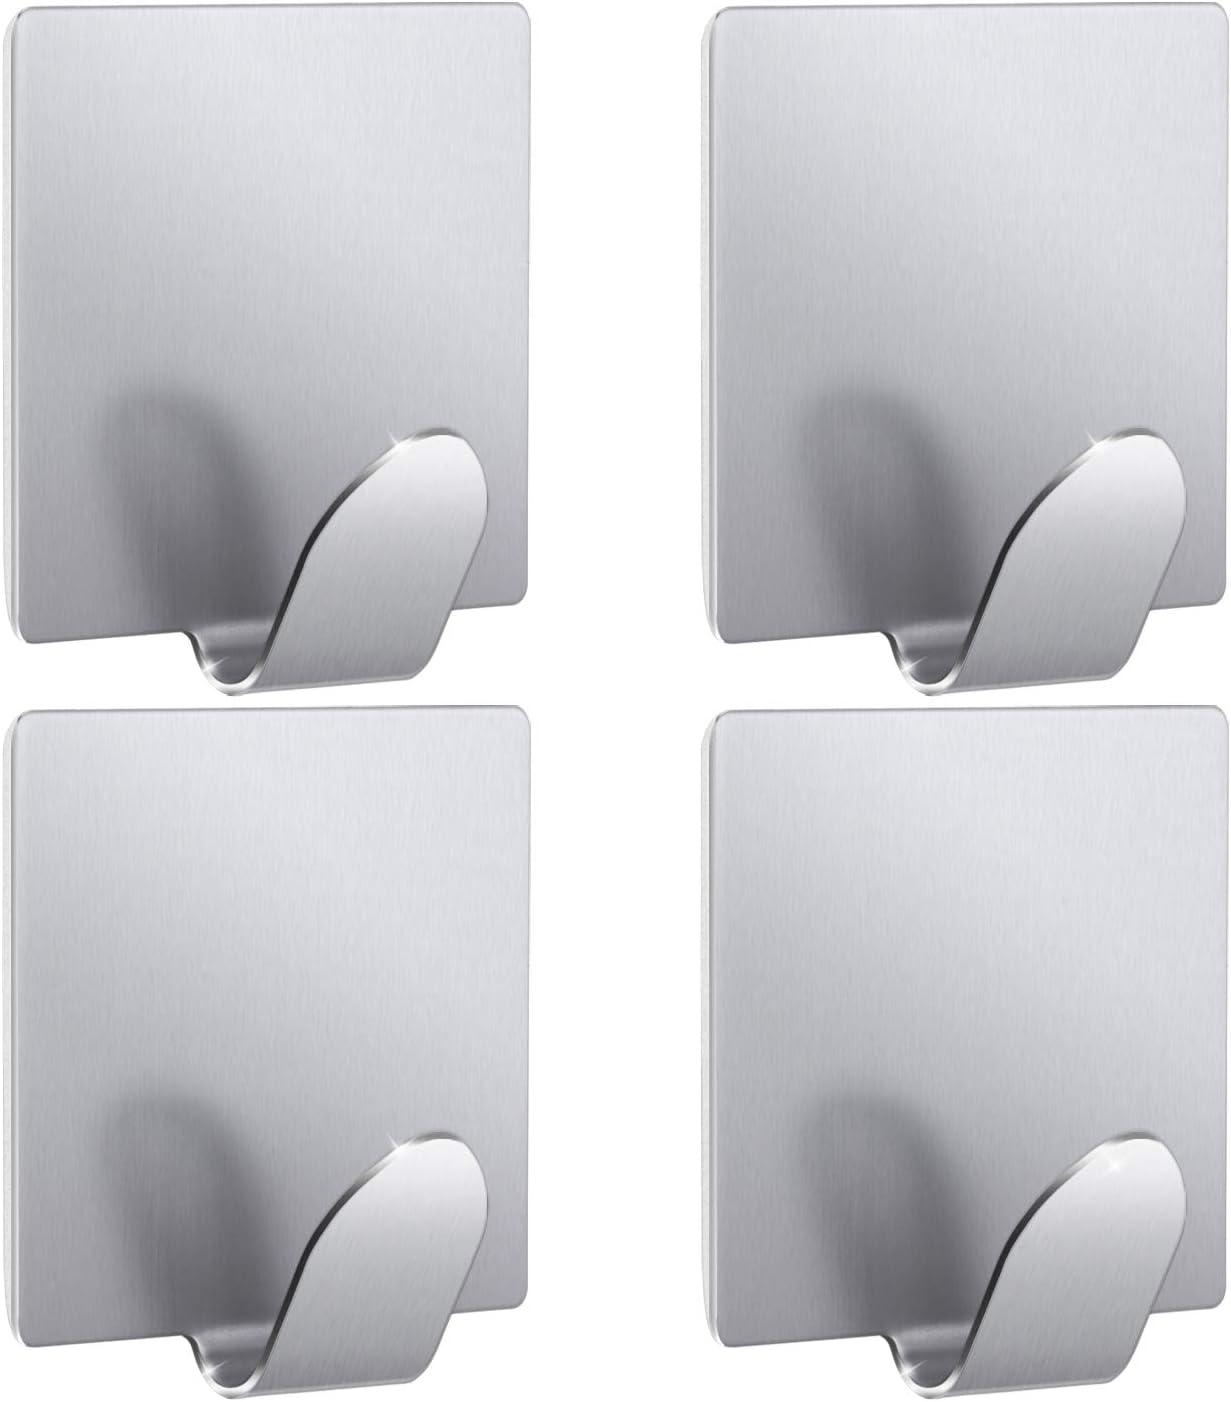 Amazon Com Towel Hooks Kone Self Adhesive Hook Stainless Steel For Bathroom Office Home Waterproof Heavy Duty Wall Hooks Rack Hanger Fit Robe Hat Keys Silver 4 Pieces Home Kitchen